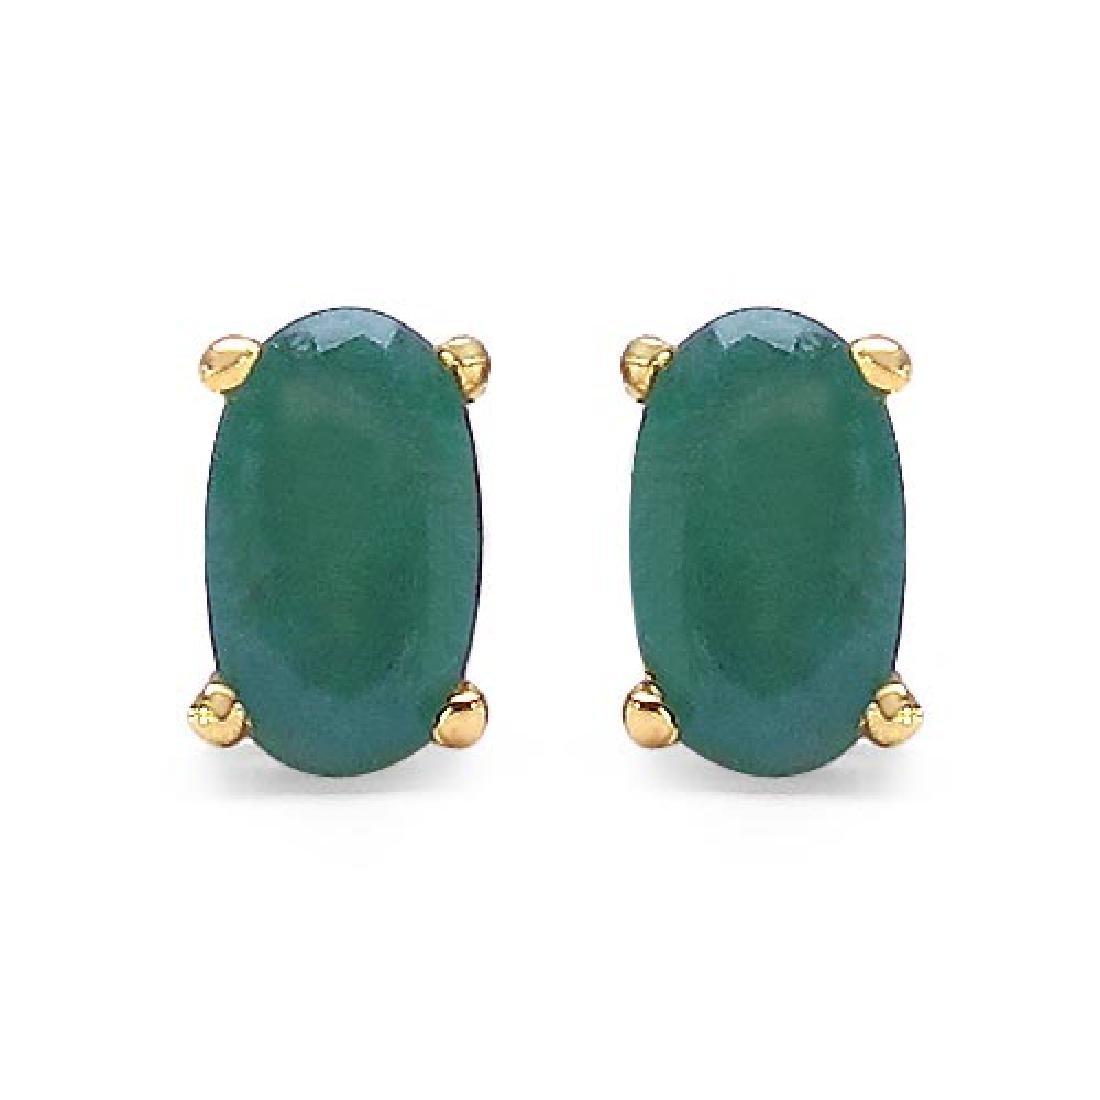 0.54 Carat Genuine Emerald 10K Yellow Gold Earrings